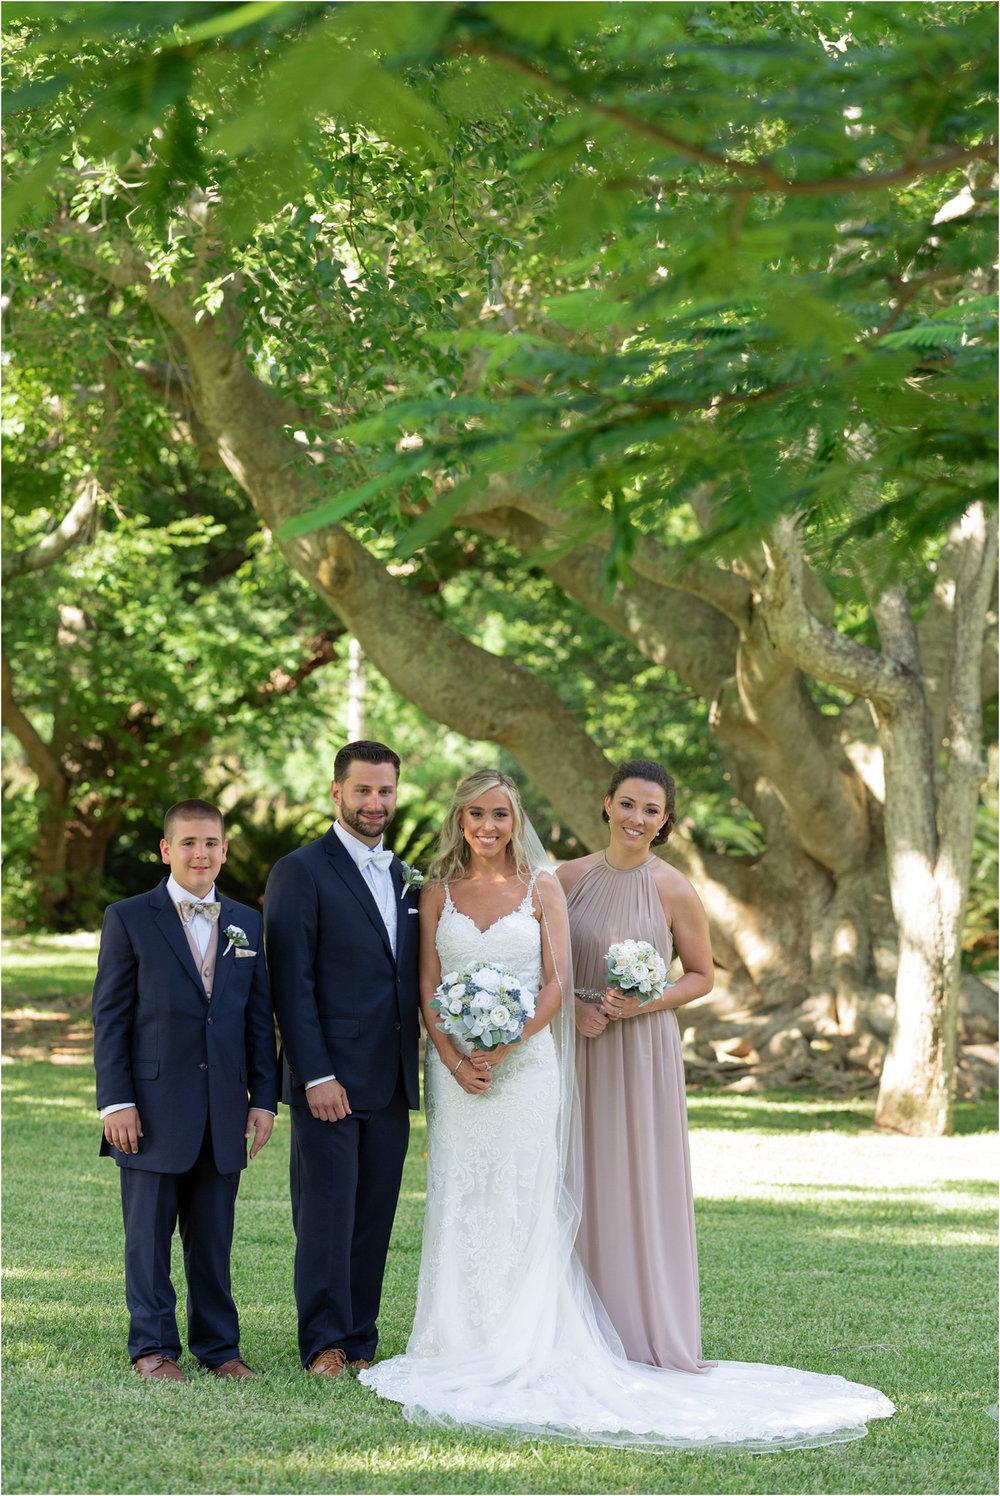 ©FianderFoto_Destination_Wedding_Photographer_Bermuda_Wedding_Photographer_Jaclyn_Anthony__Grotto Bay_086.jpg